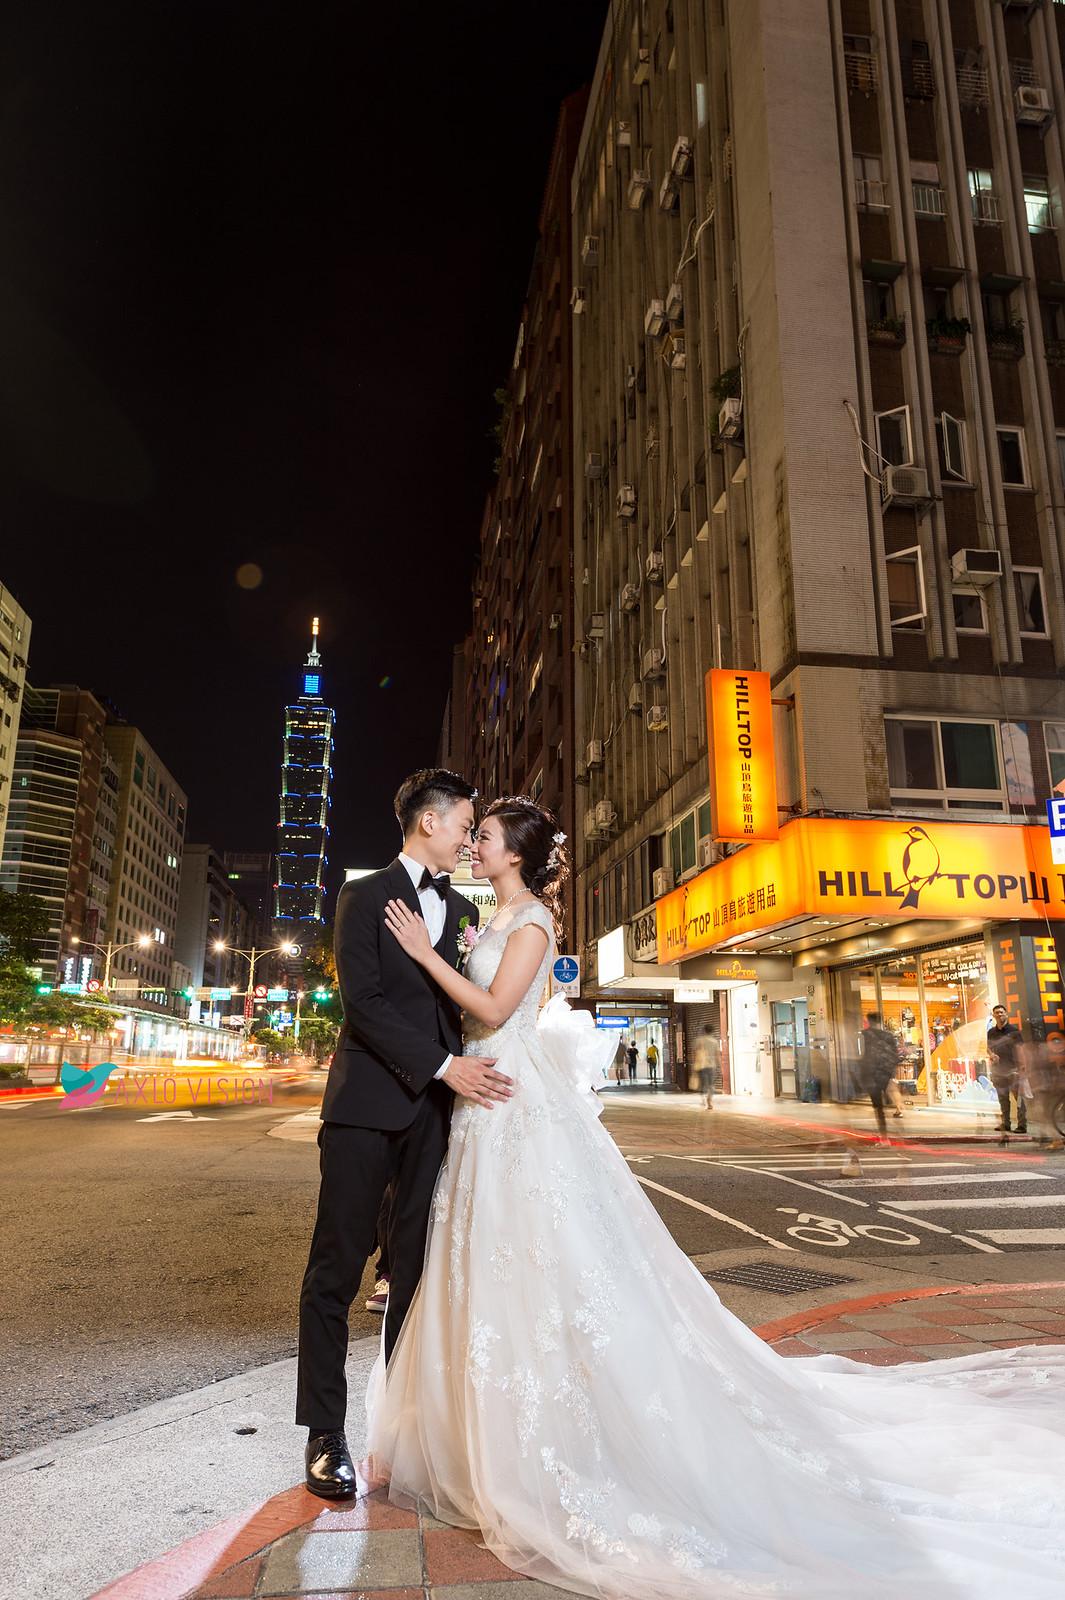 20170916 WeddingDay_158